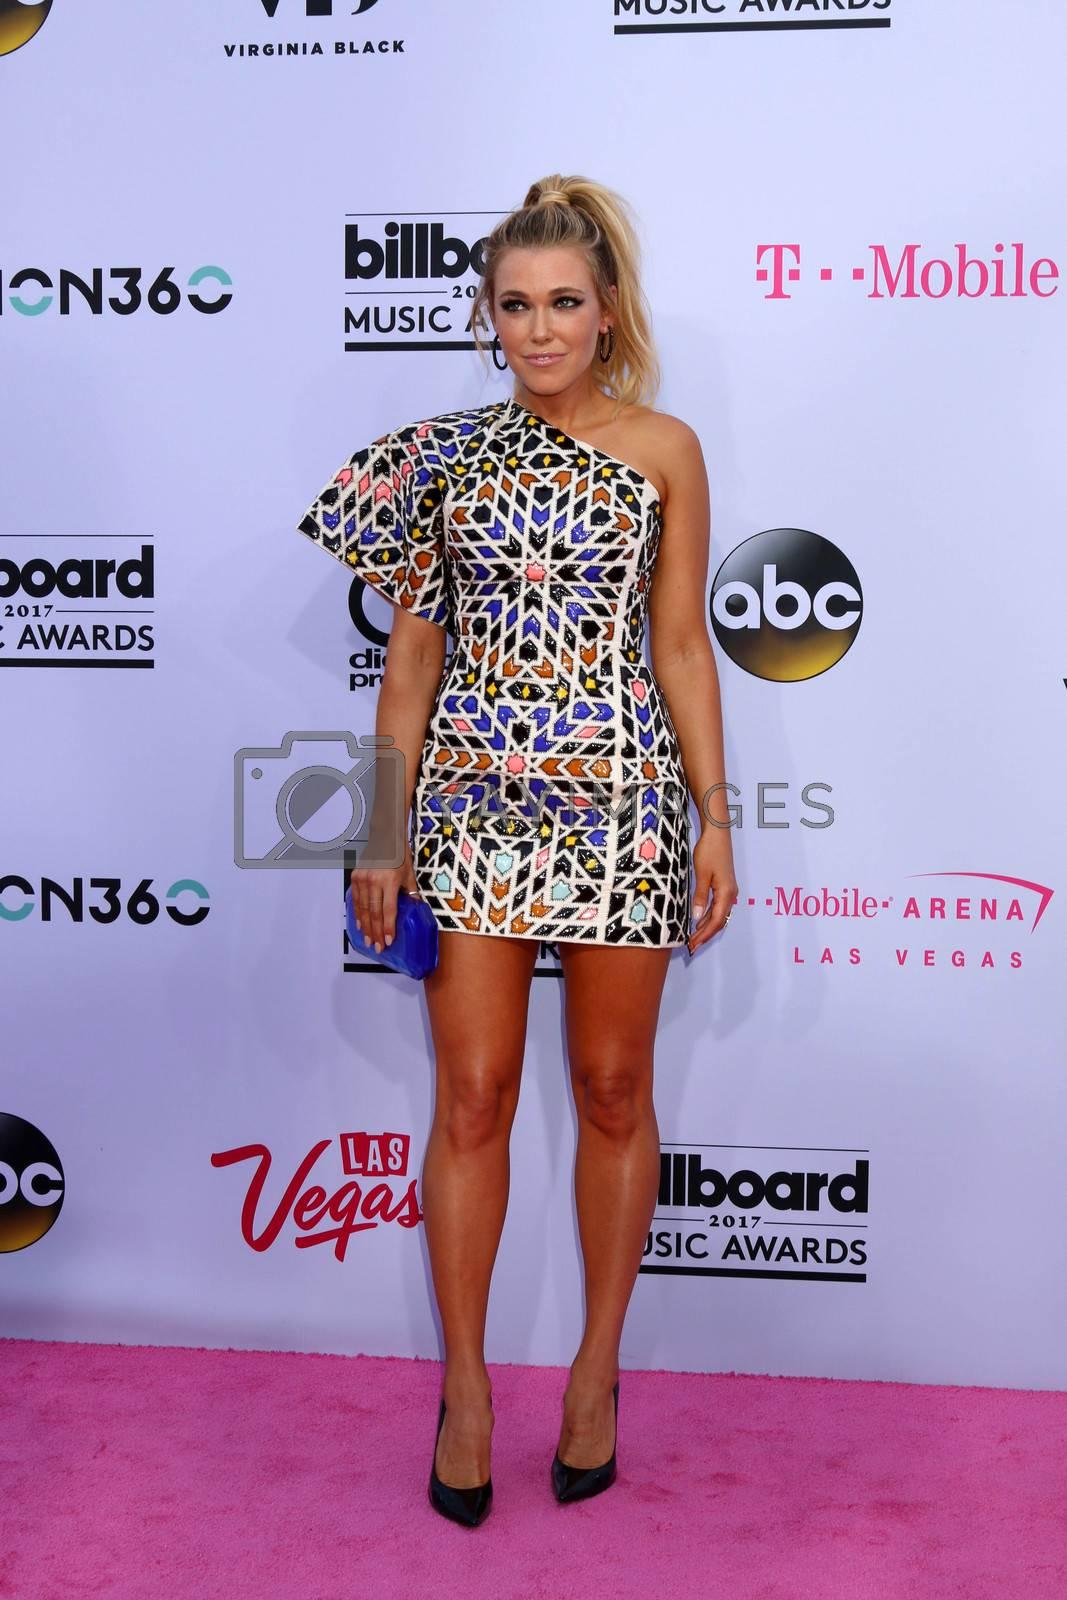 Rachel Platten at the 2017 Billboard Awards Arrivals, T-Mobile Arena, Las Vegas, NV 05-21-17